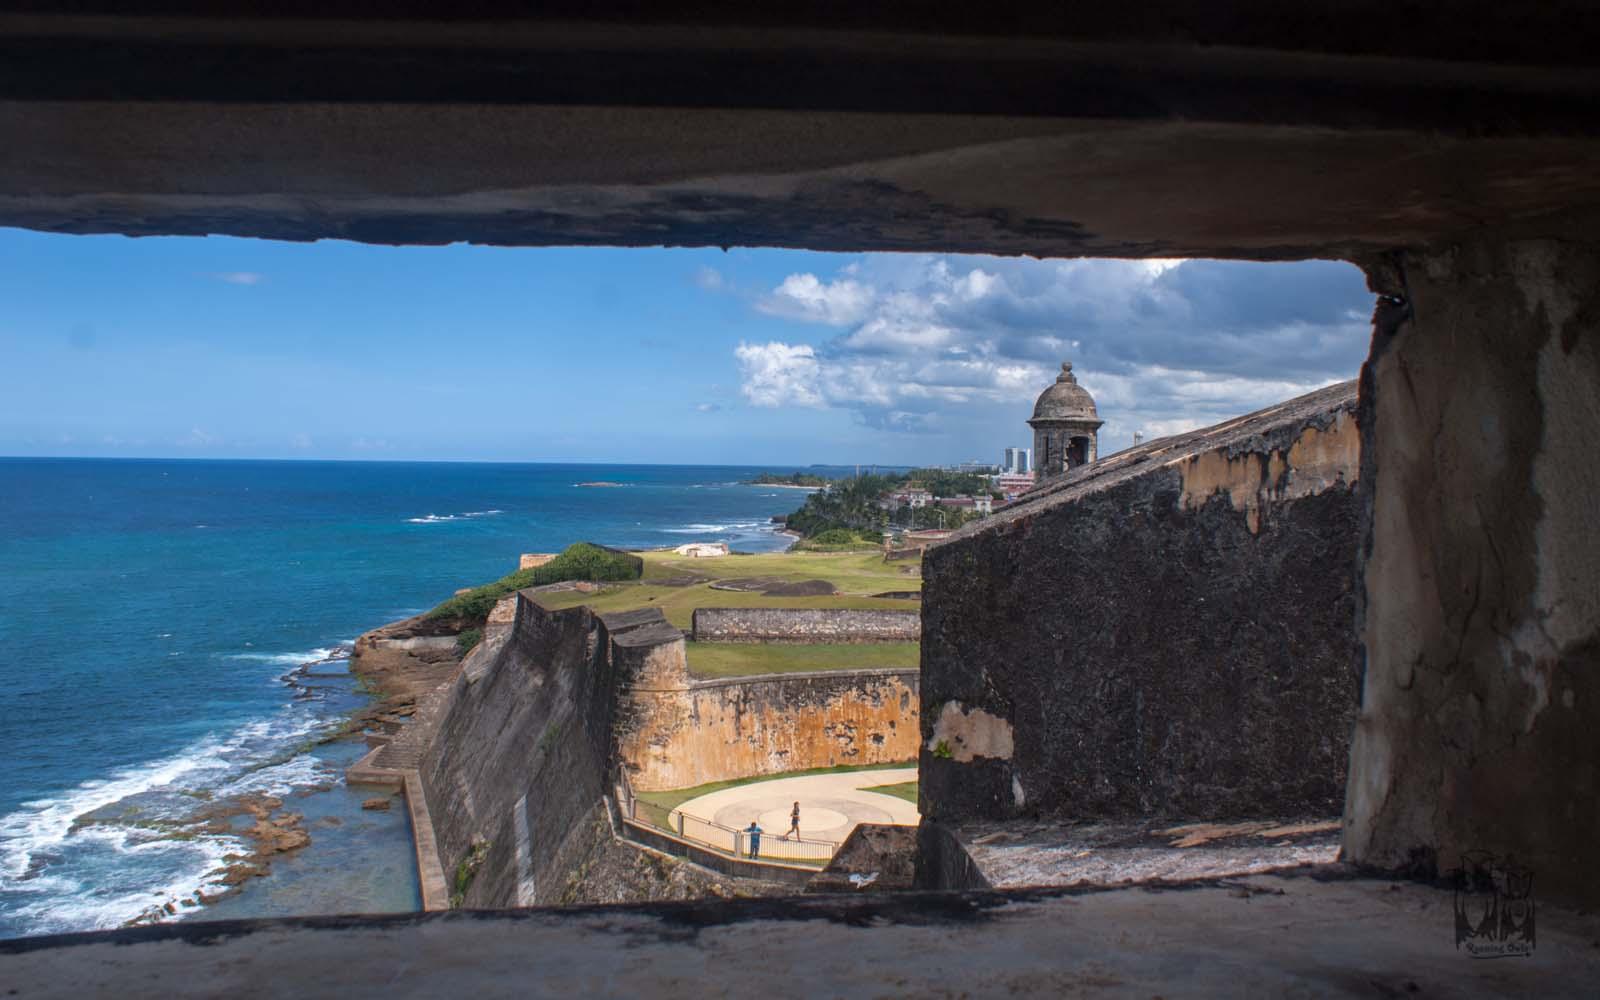 Castillo San Cristobal fort,sanjuan historical site, sanjuan fort